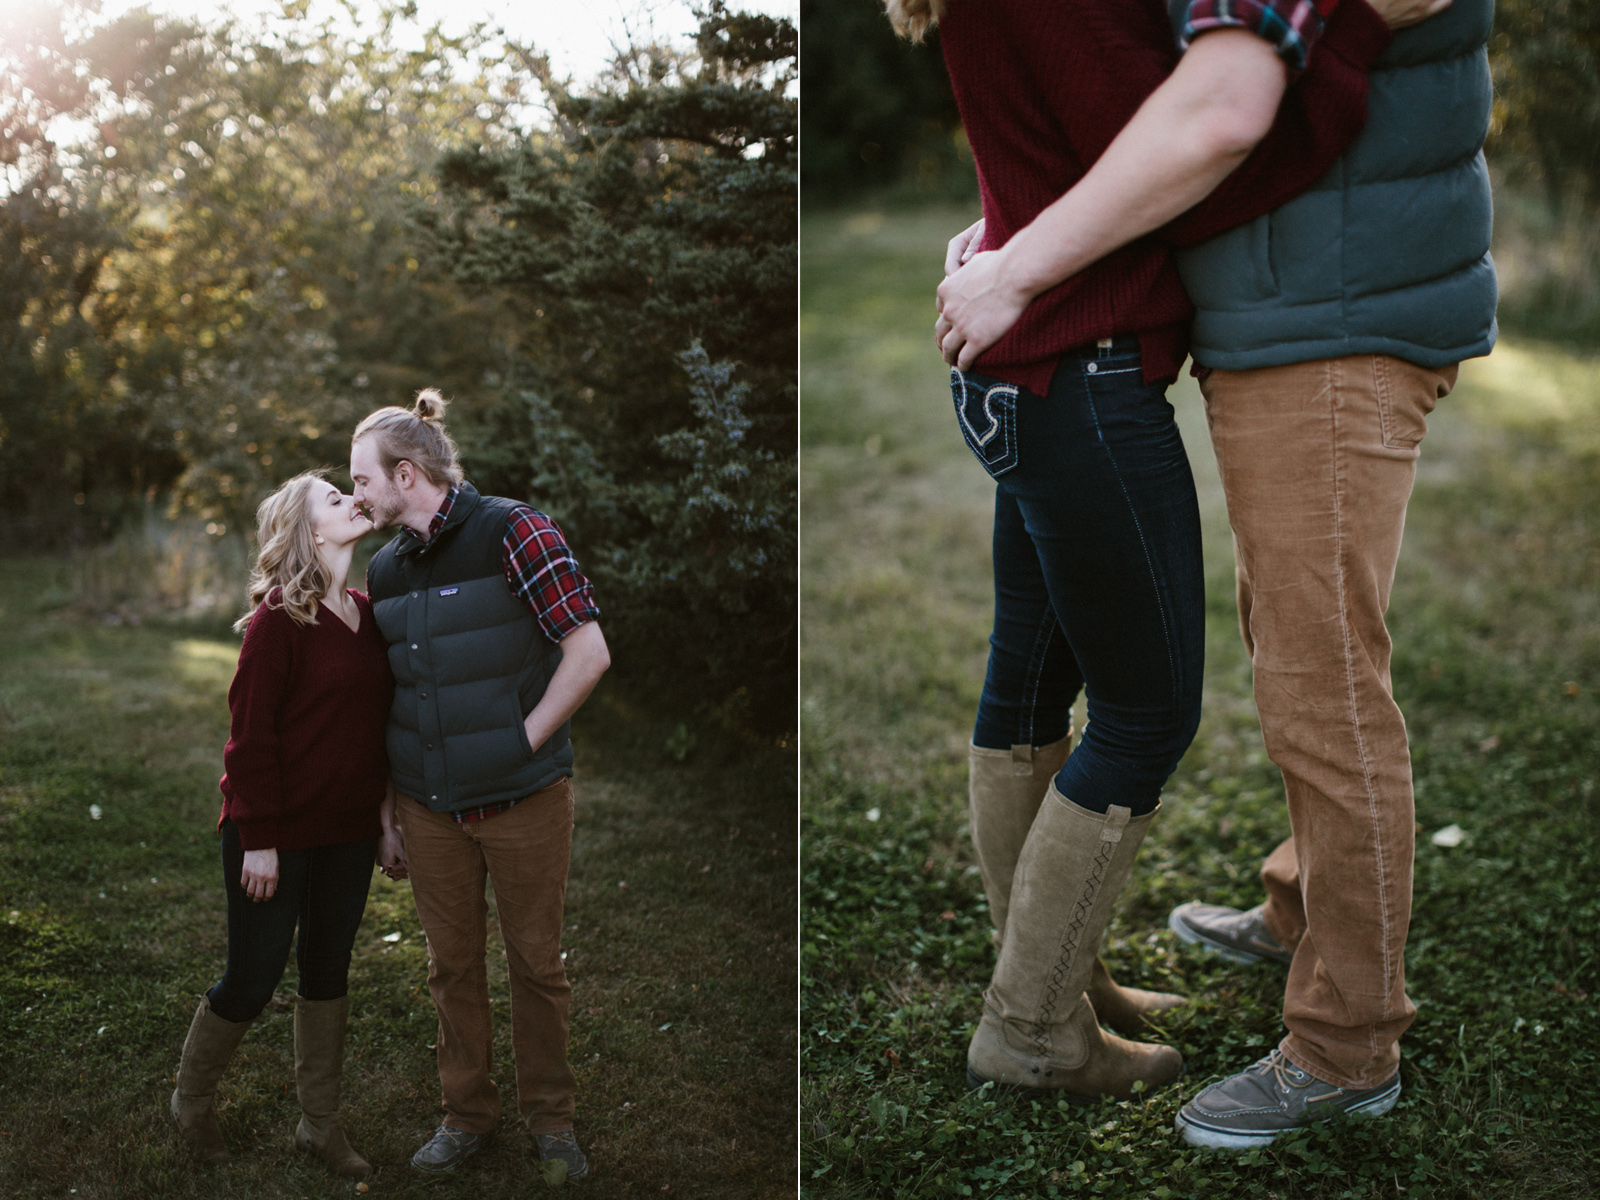 Sioux_Falls_Des_Moines_Engagement_Wedding_Photographer_17.jpg